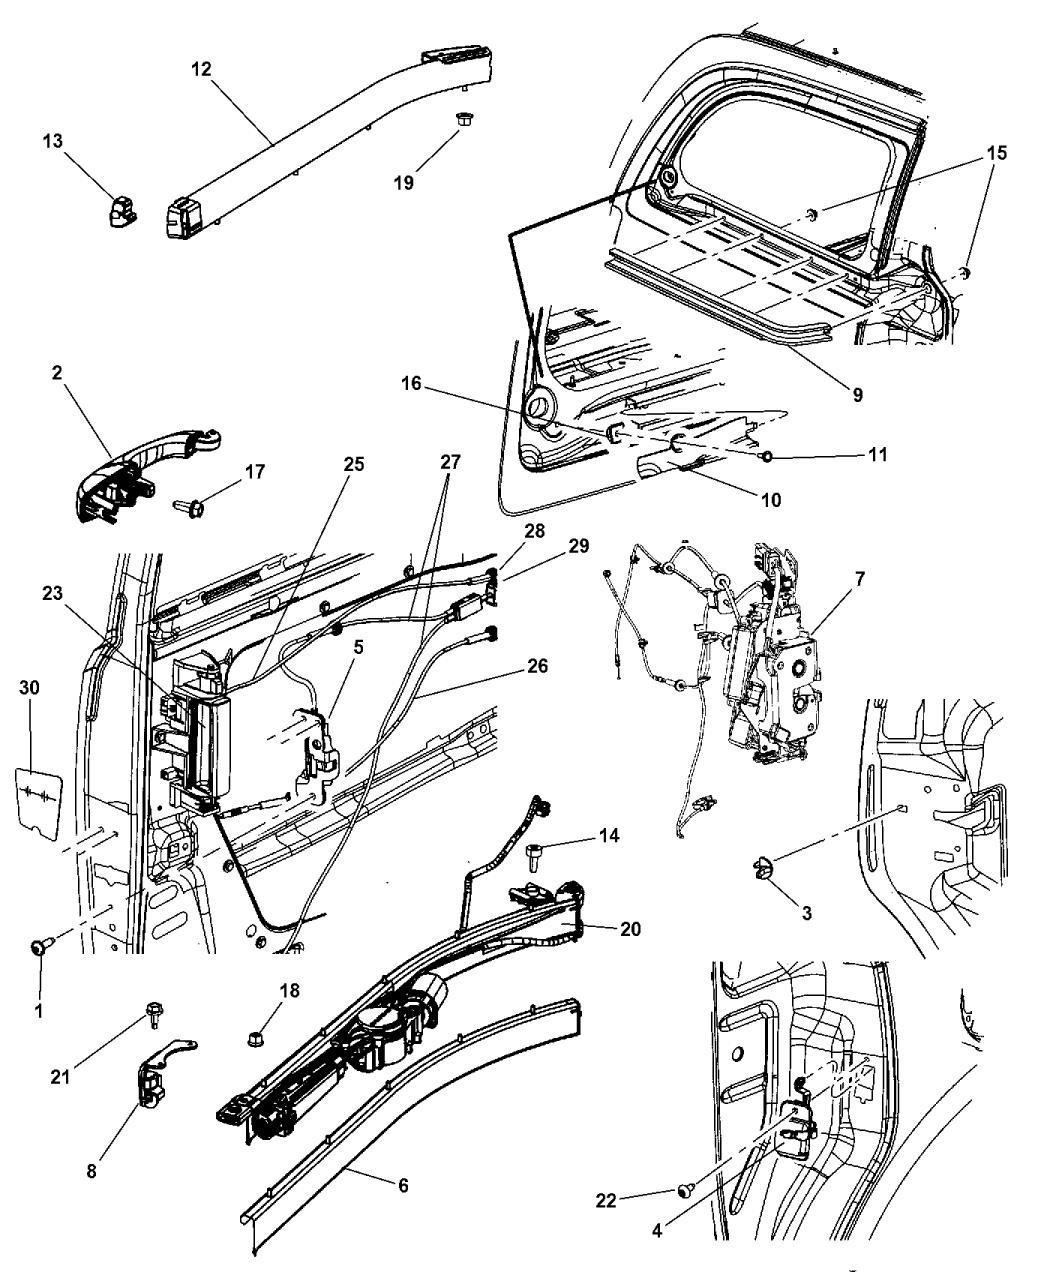 Dodge Door Parts Diagram • Wiring Diagram For Free